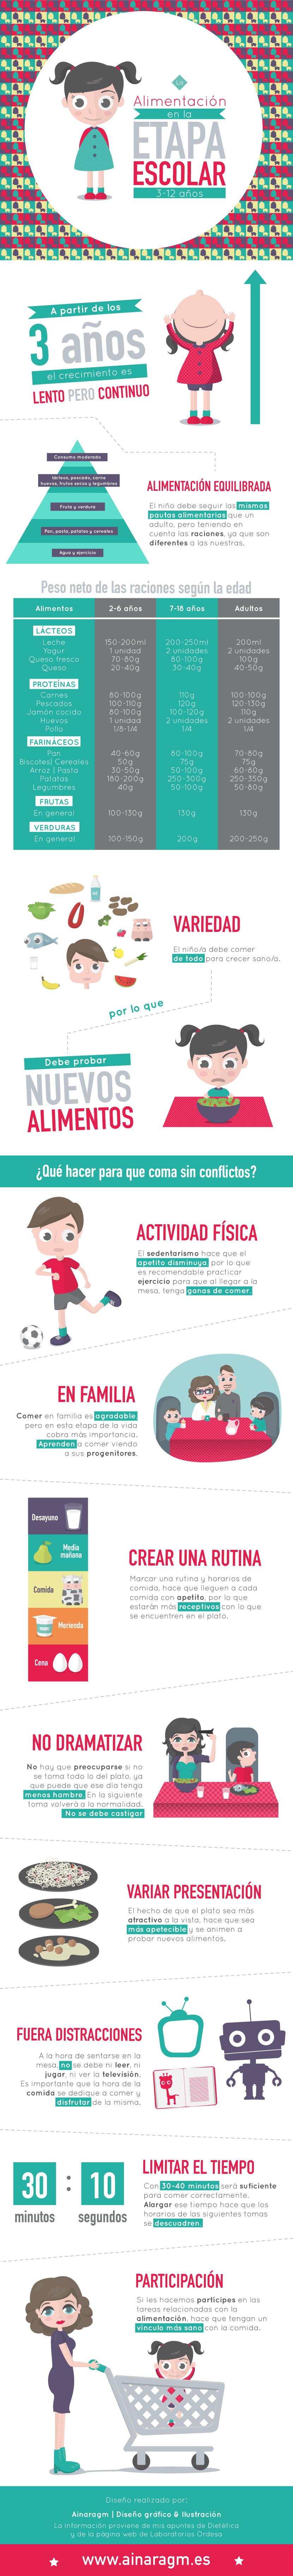 info_alimentacion_escolar